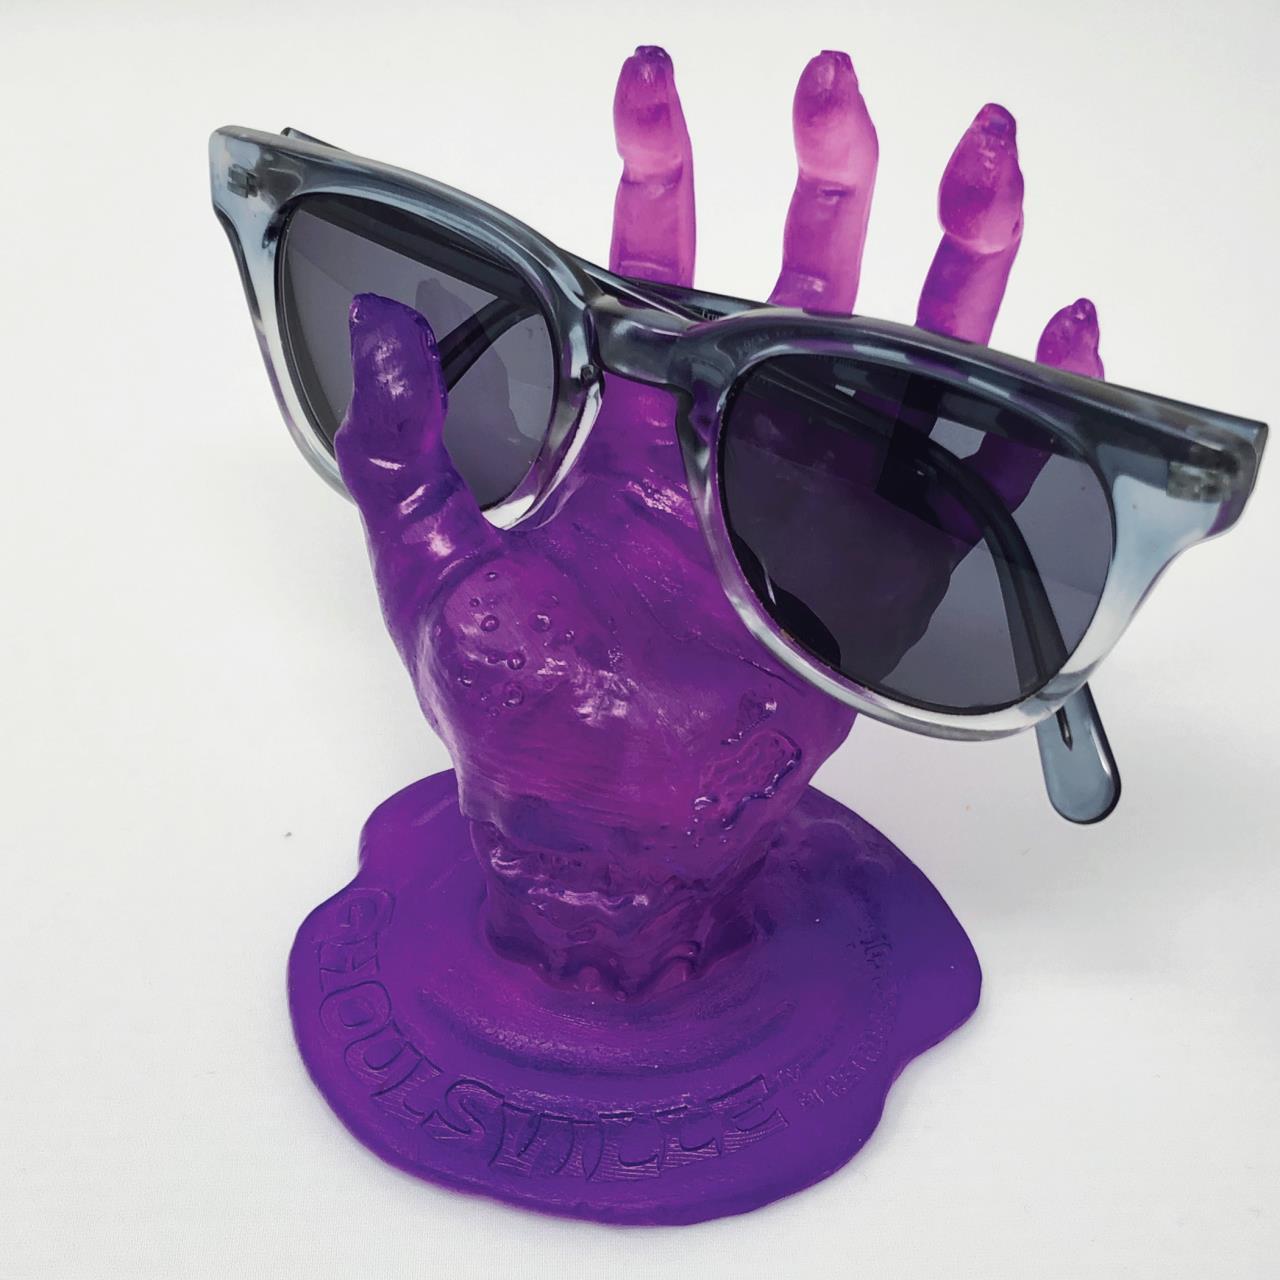 Putrid Purple Zombie Display Hand* - 0659682810096